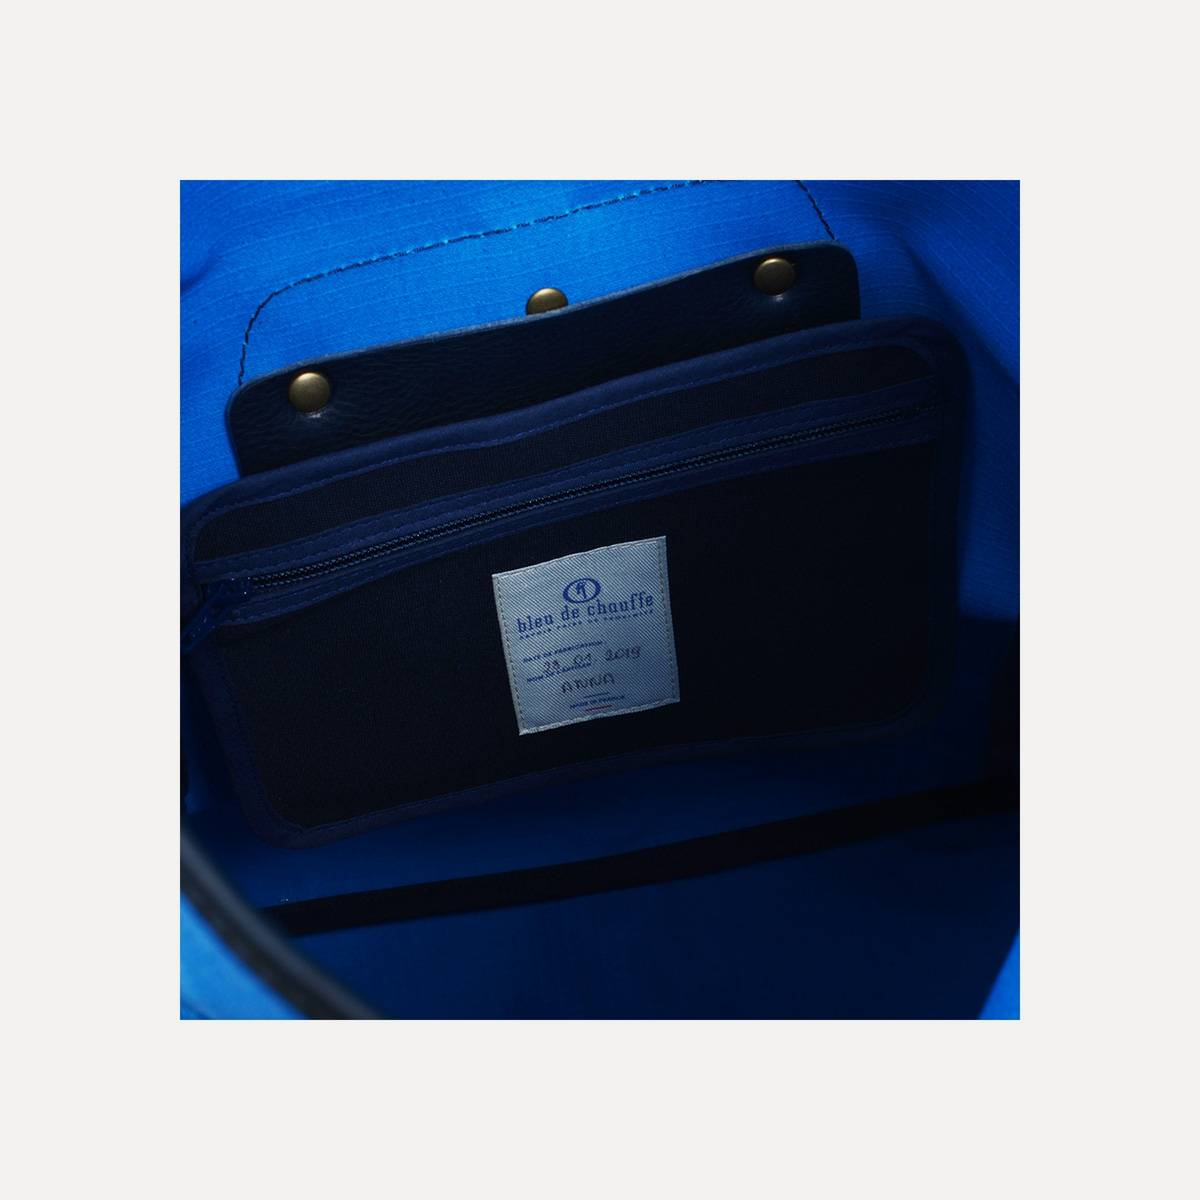 Jamy Backpack - Regentex Blue (image n°7)